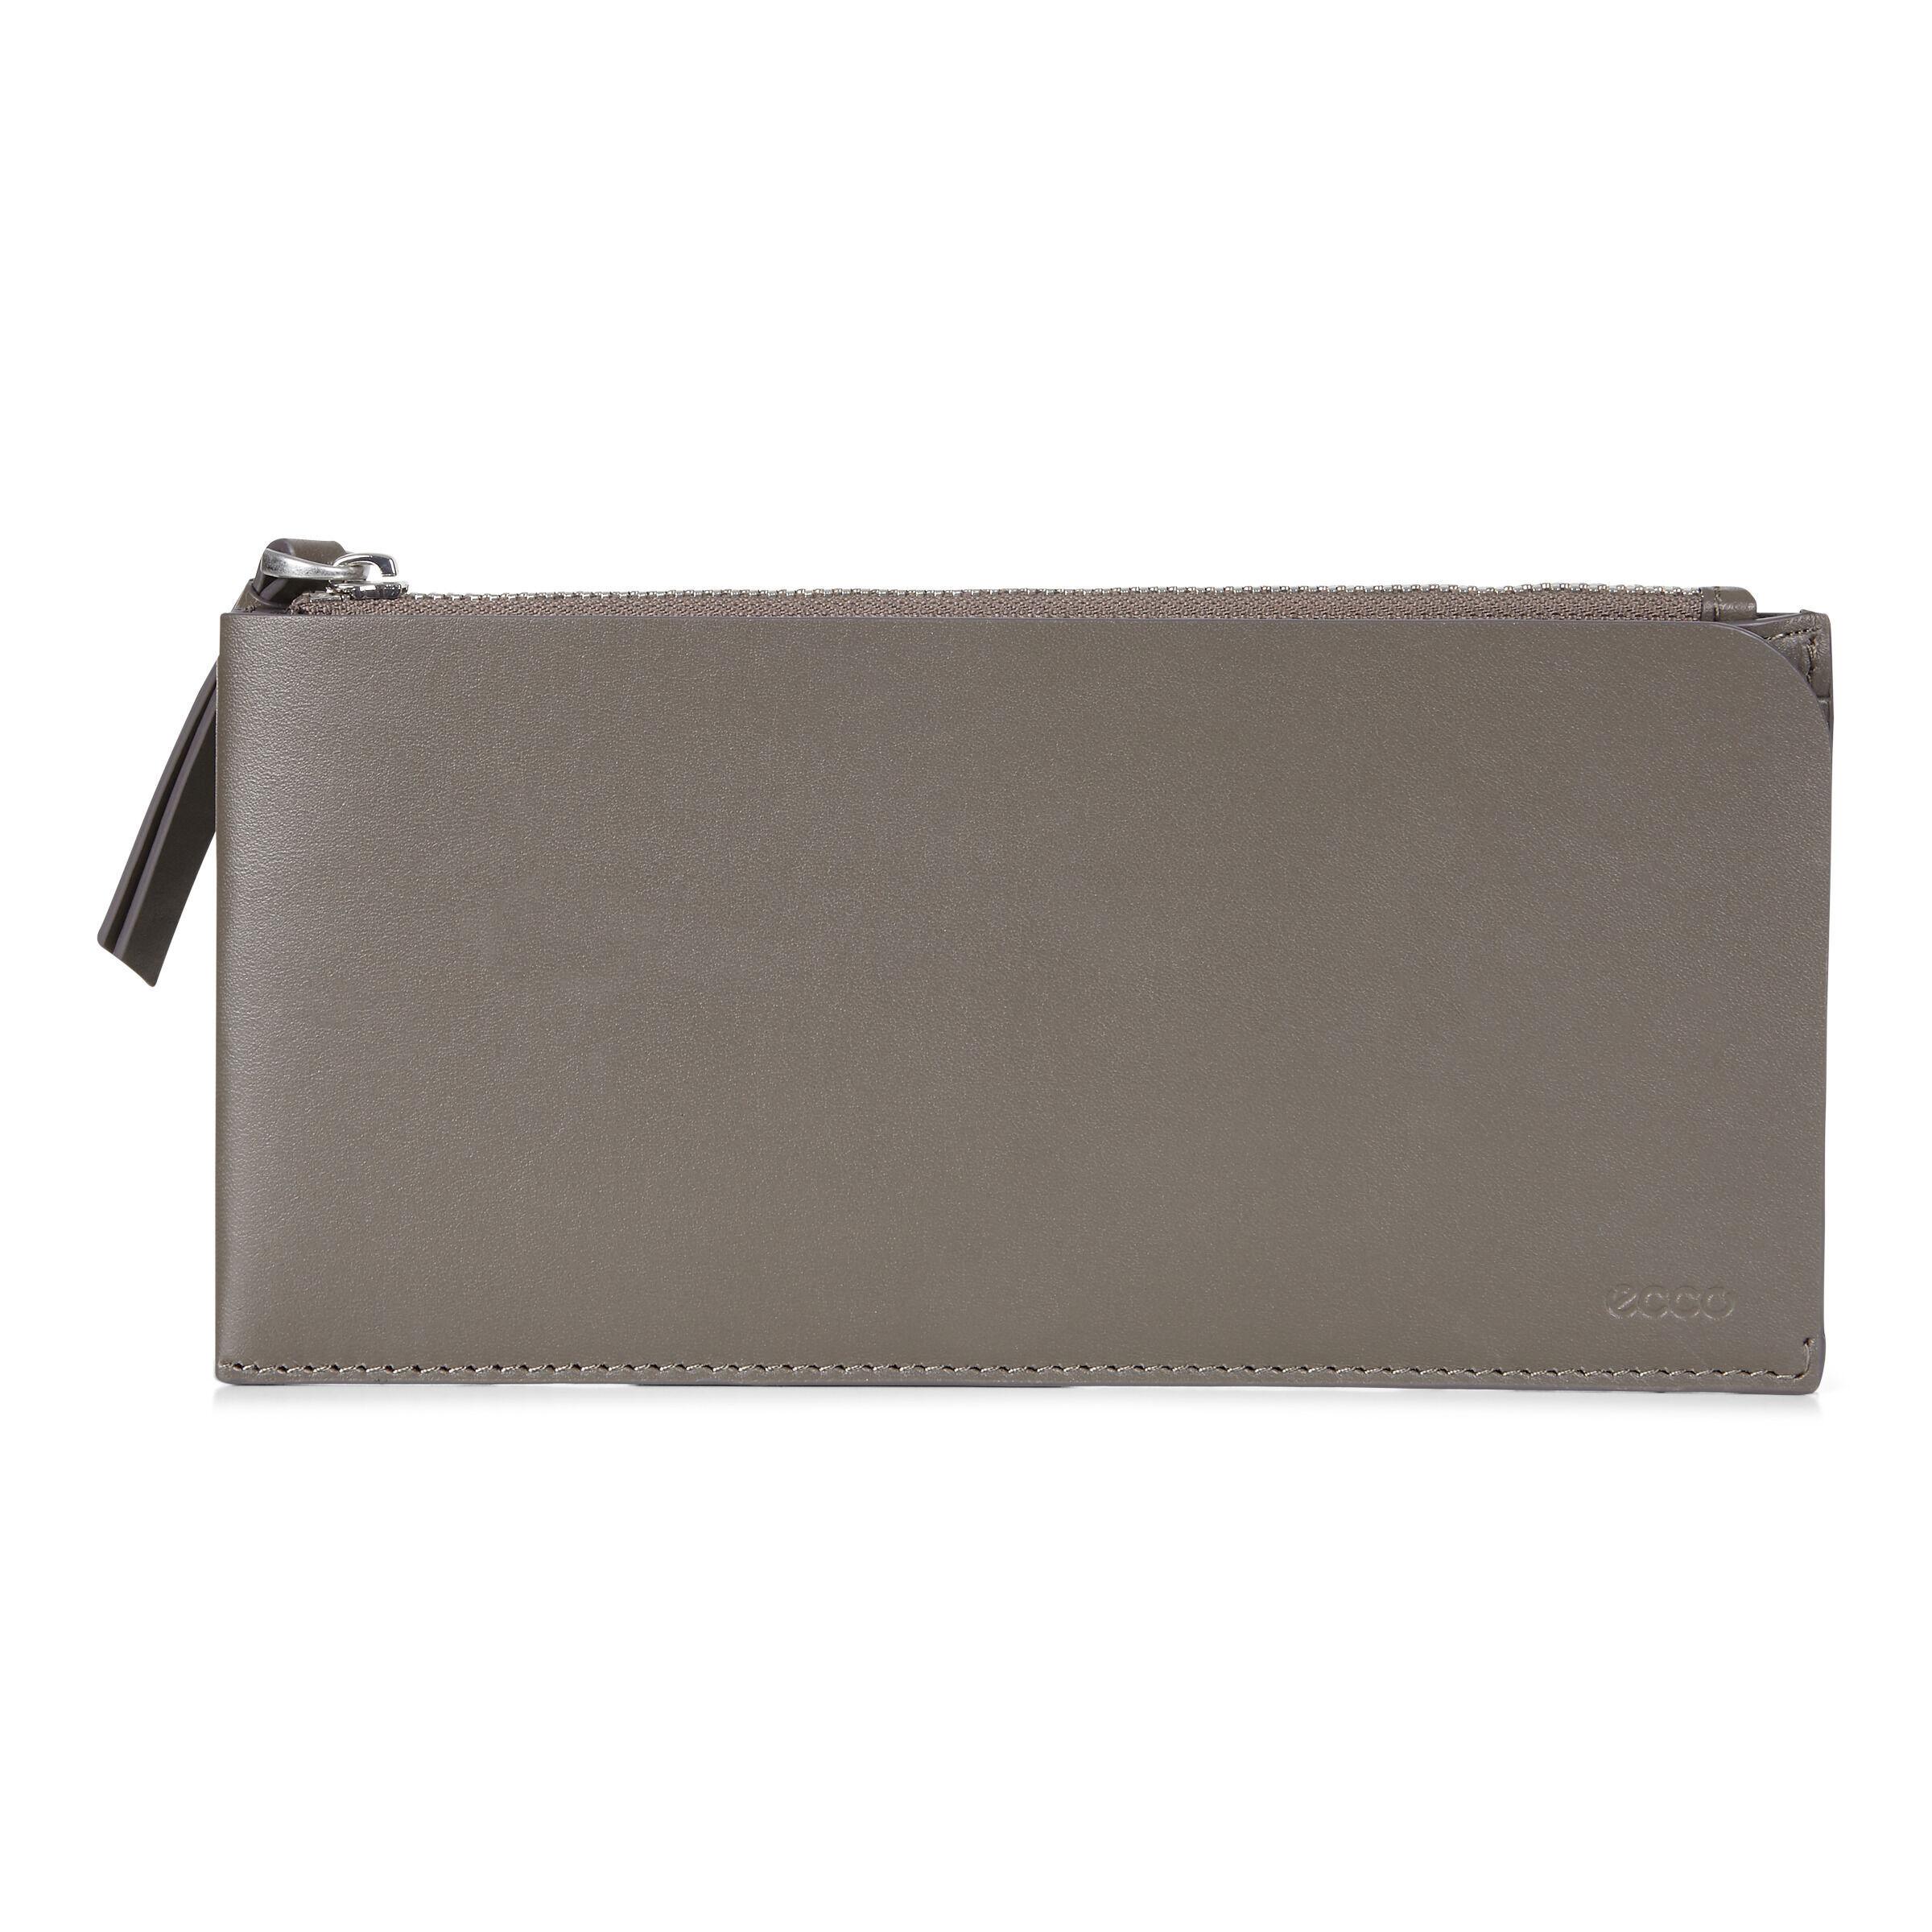 ECCO Geometrik Travel Wallet: One Size - Warm Grey